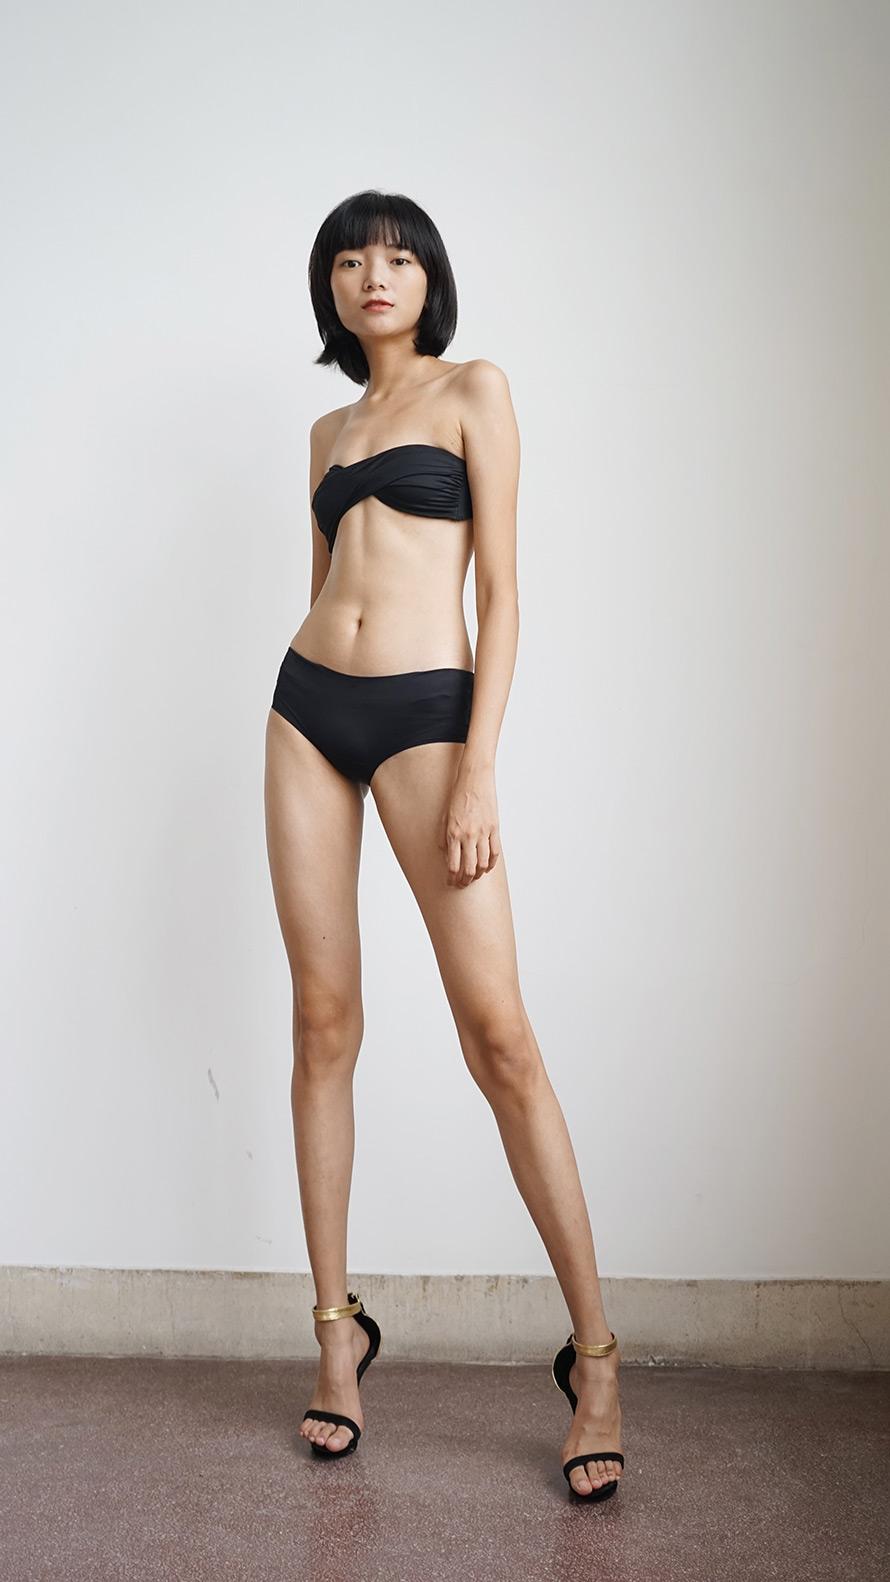 Czech model casting